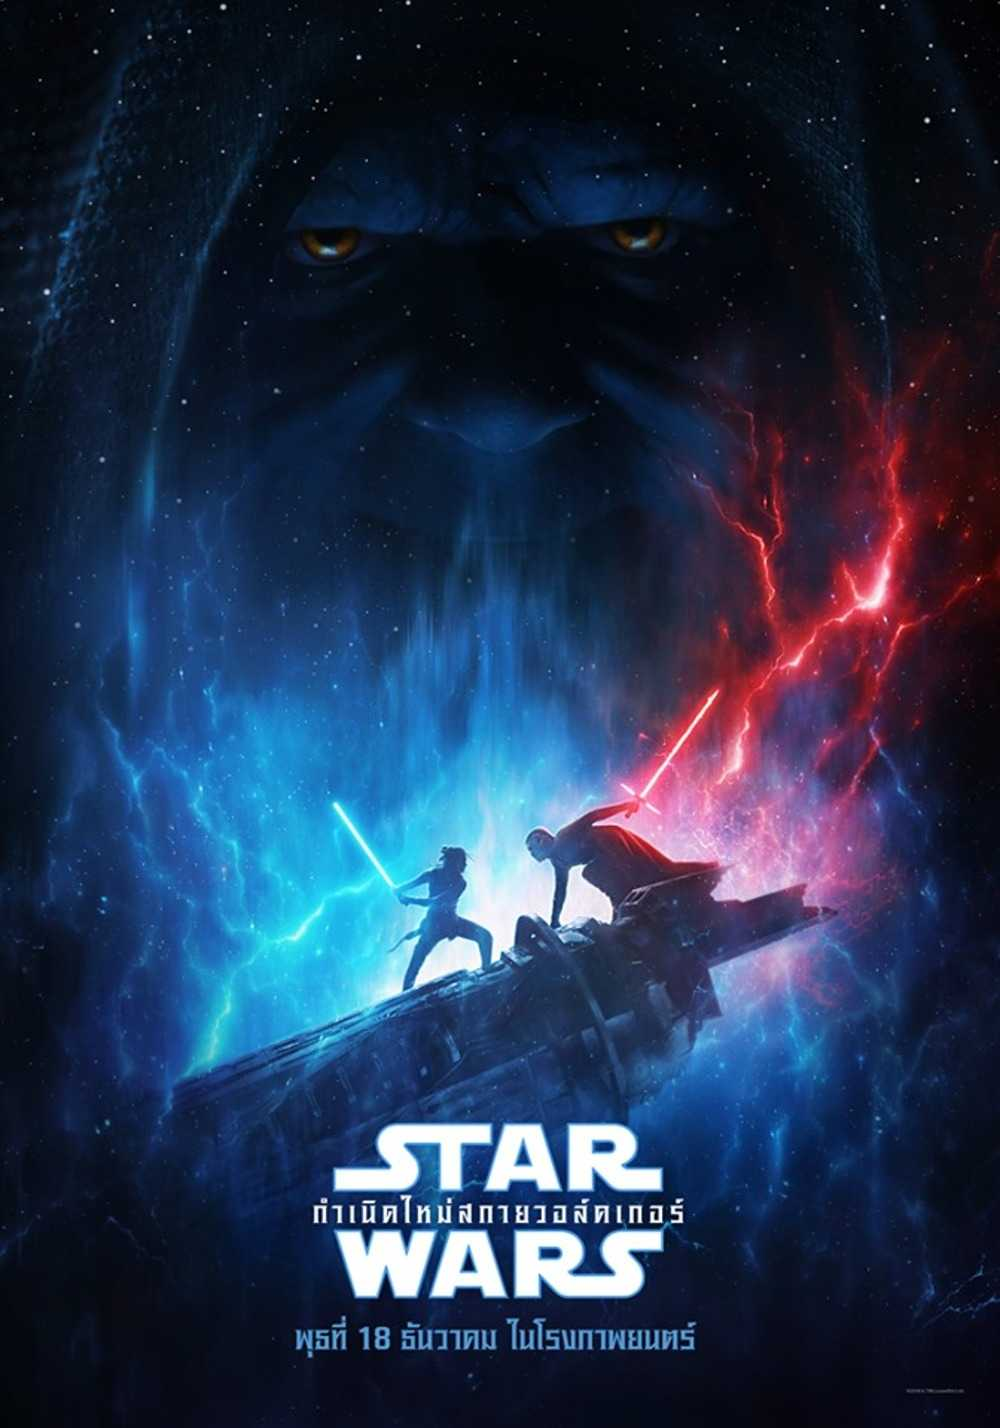 Star Wars 9 The Rise of Skywalker (2019) สตาร์ วอร์ส